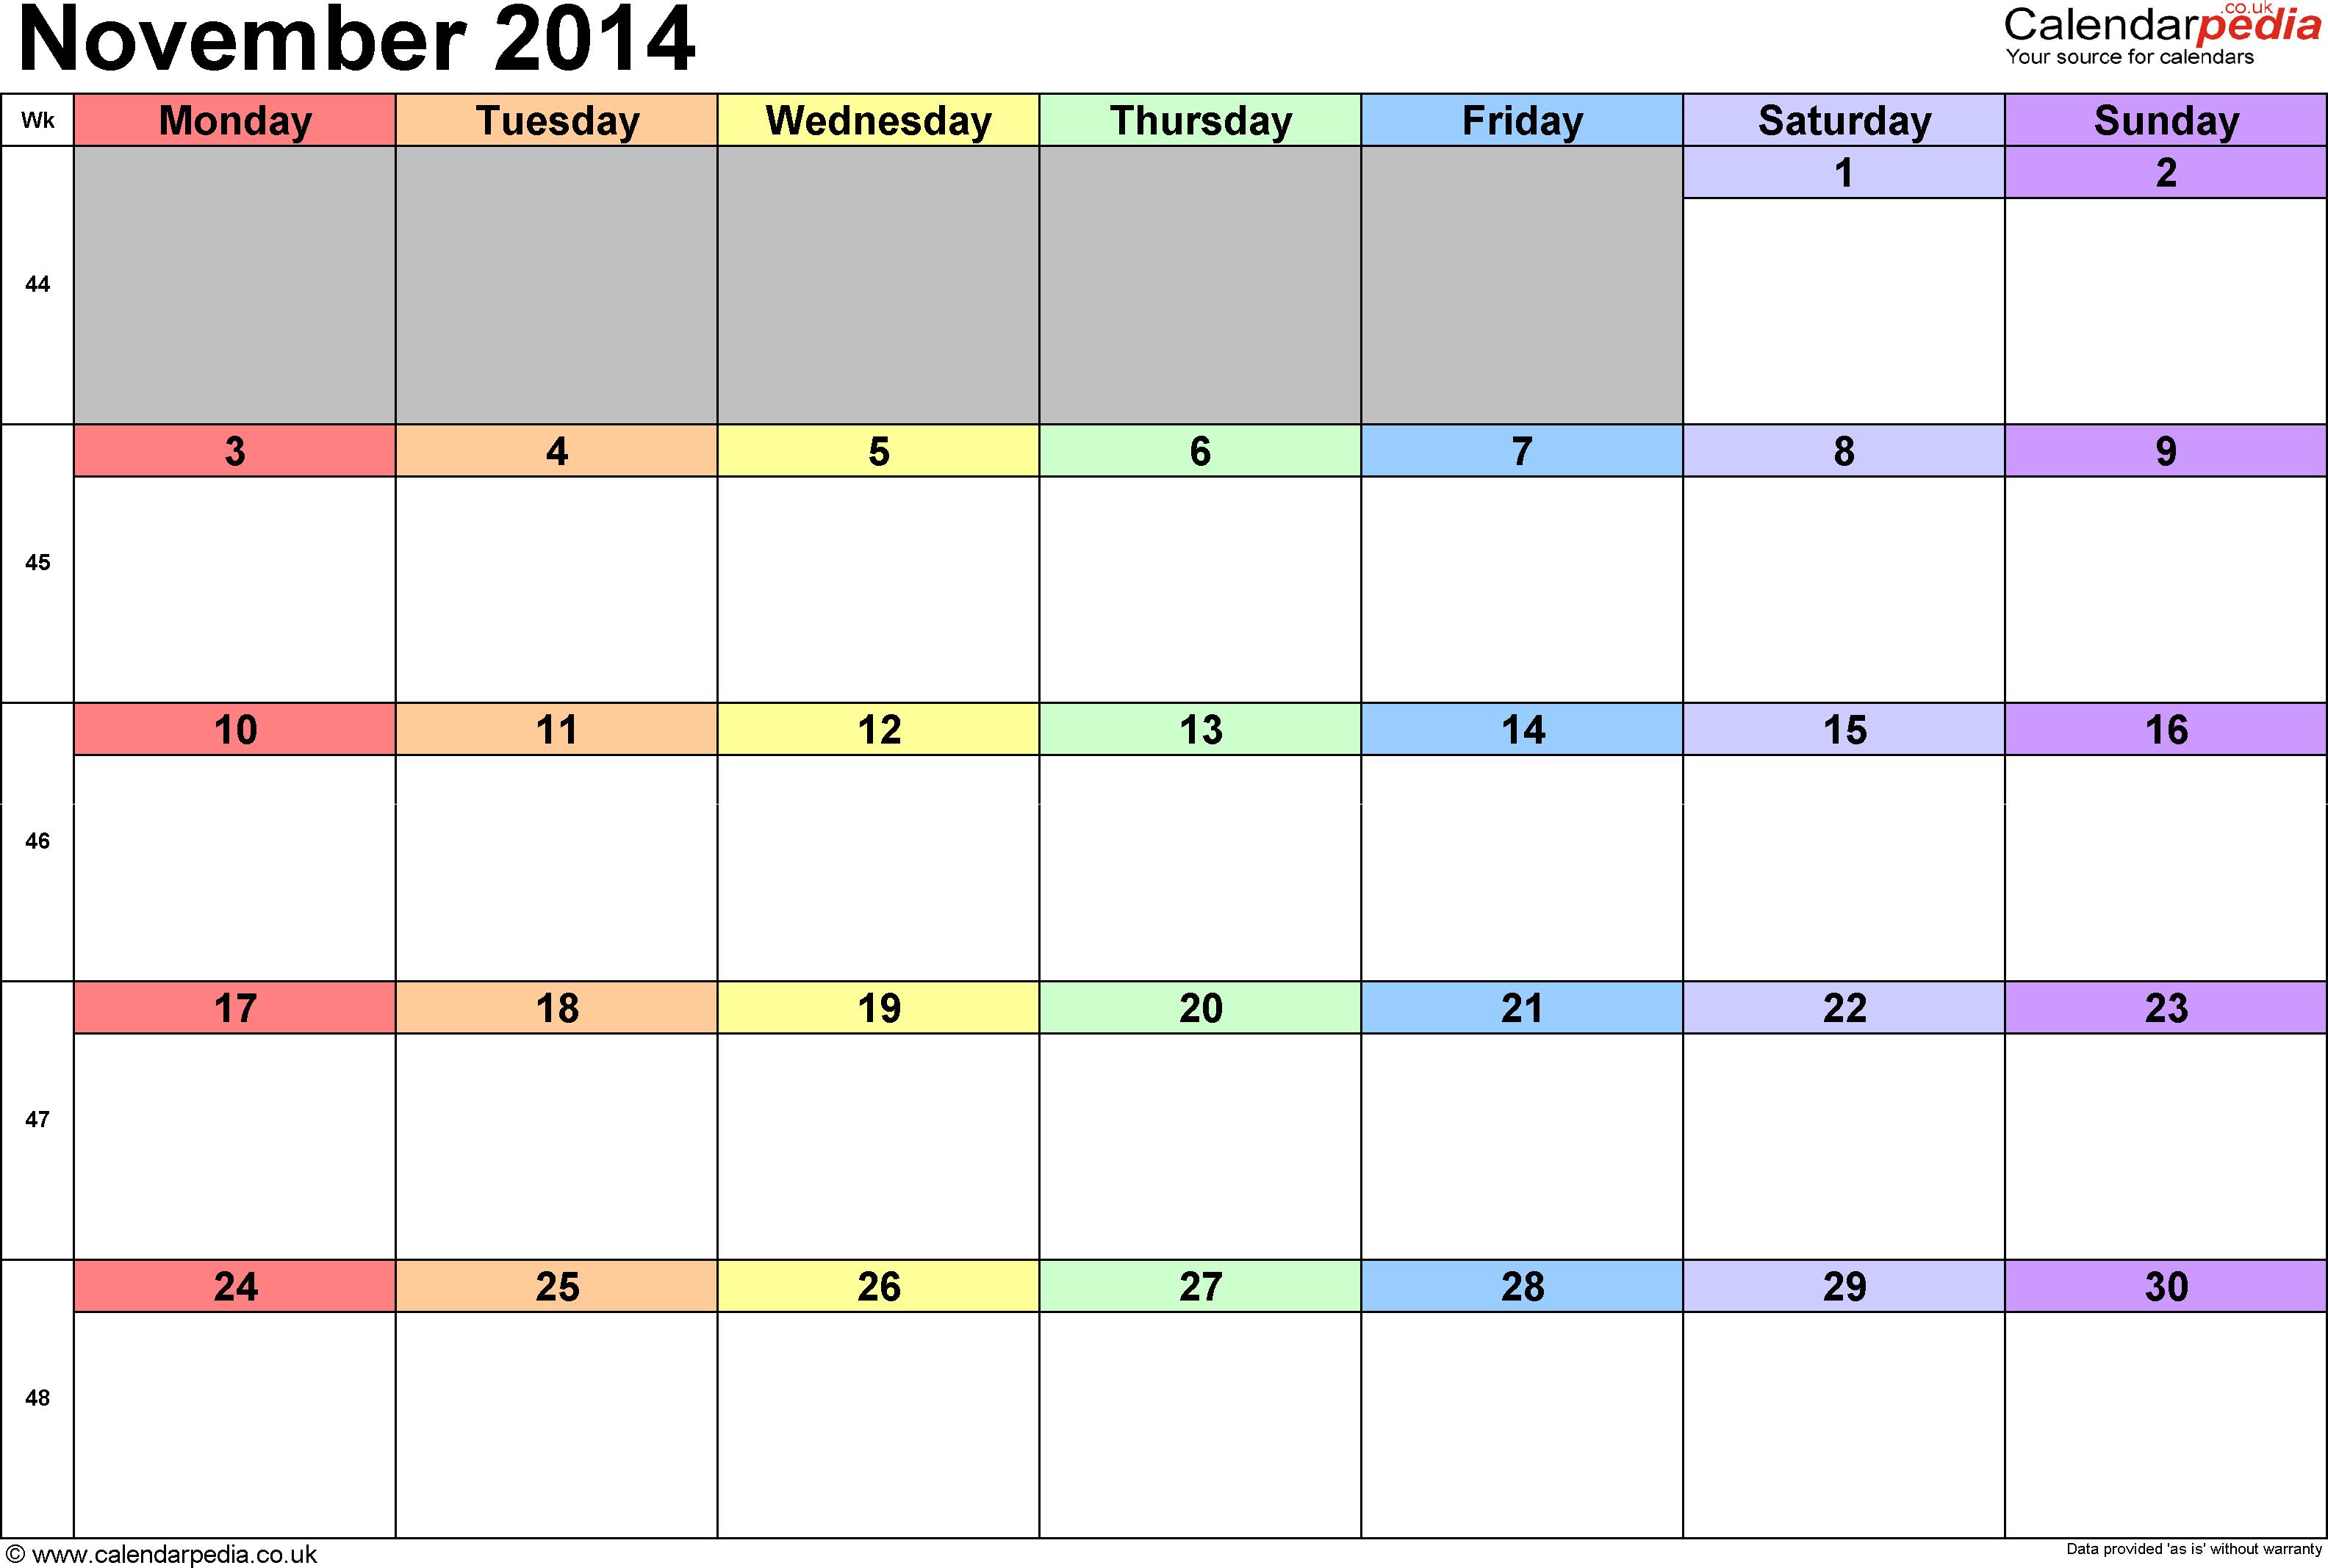 free november 2014 calendar with holidays size113.7KB